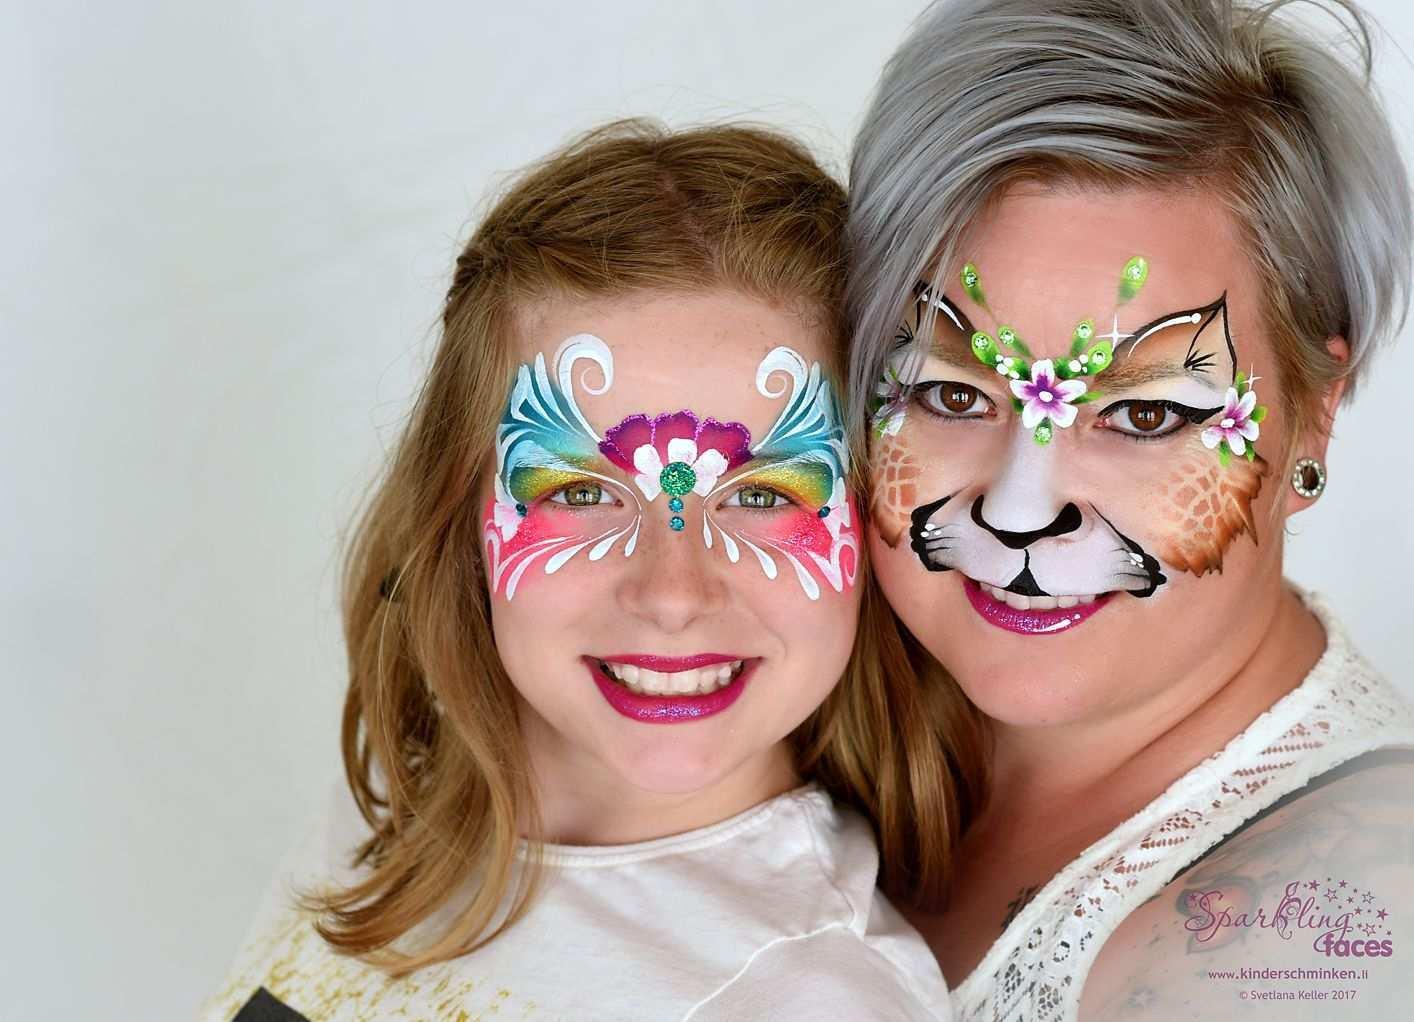 Www Kinderschminken Li Kinderschminken Kinderschminken Vorlagen Schminkfarben Kaufen Kinderschminken Kurse Schminkfar Maquillaje Infantil Caras Maquillaje